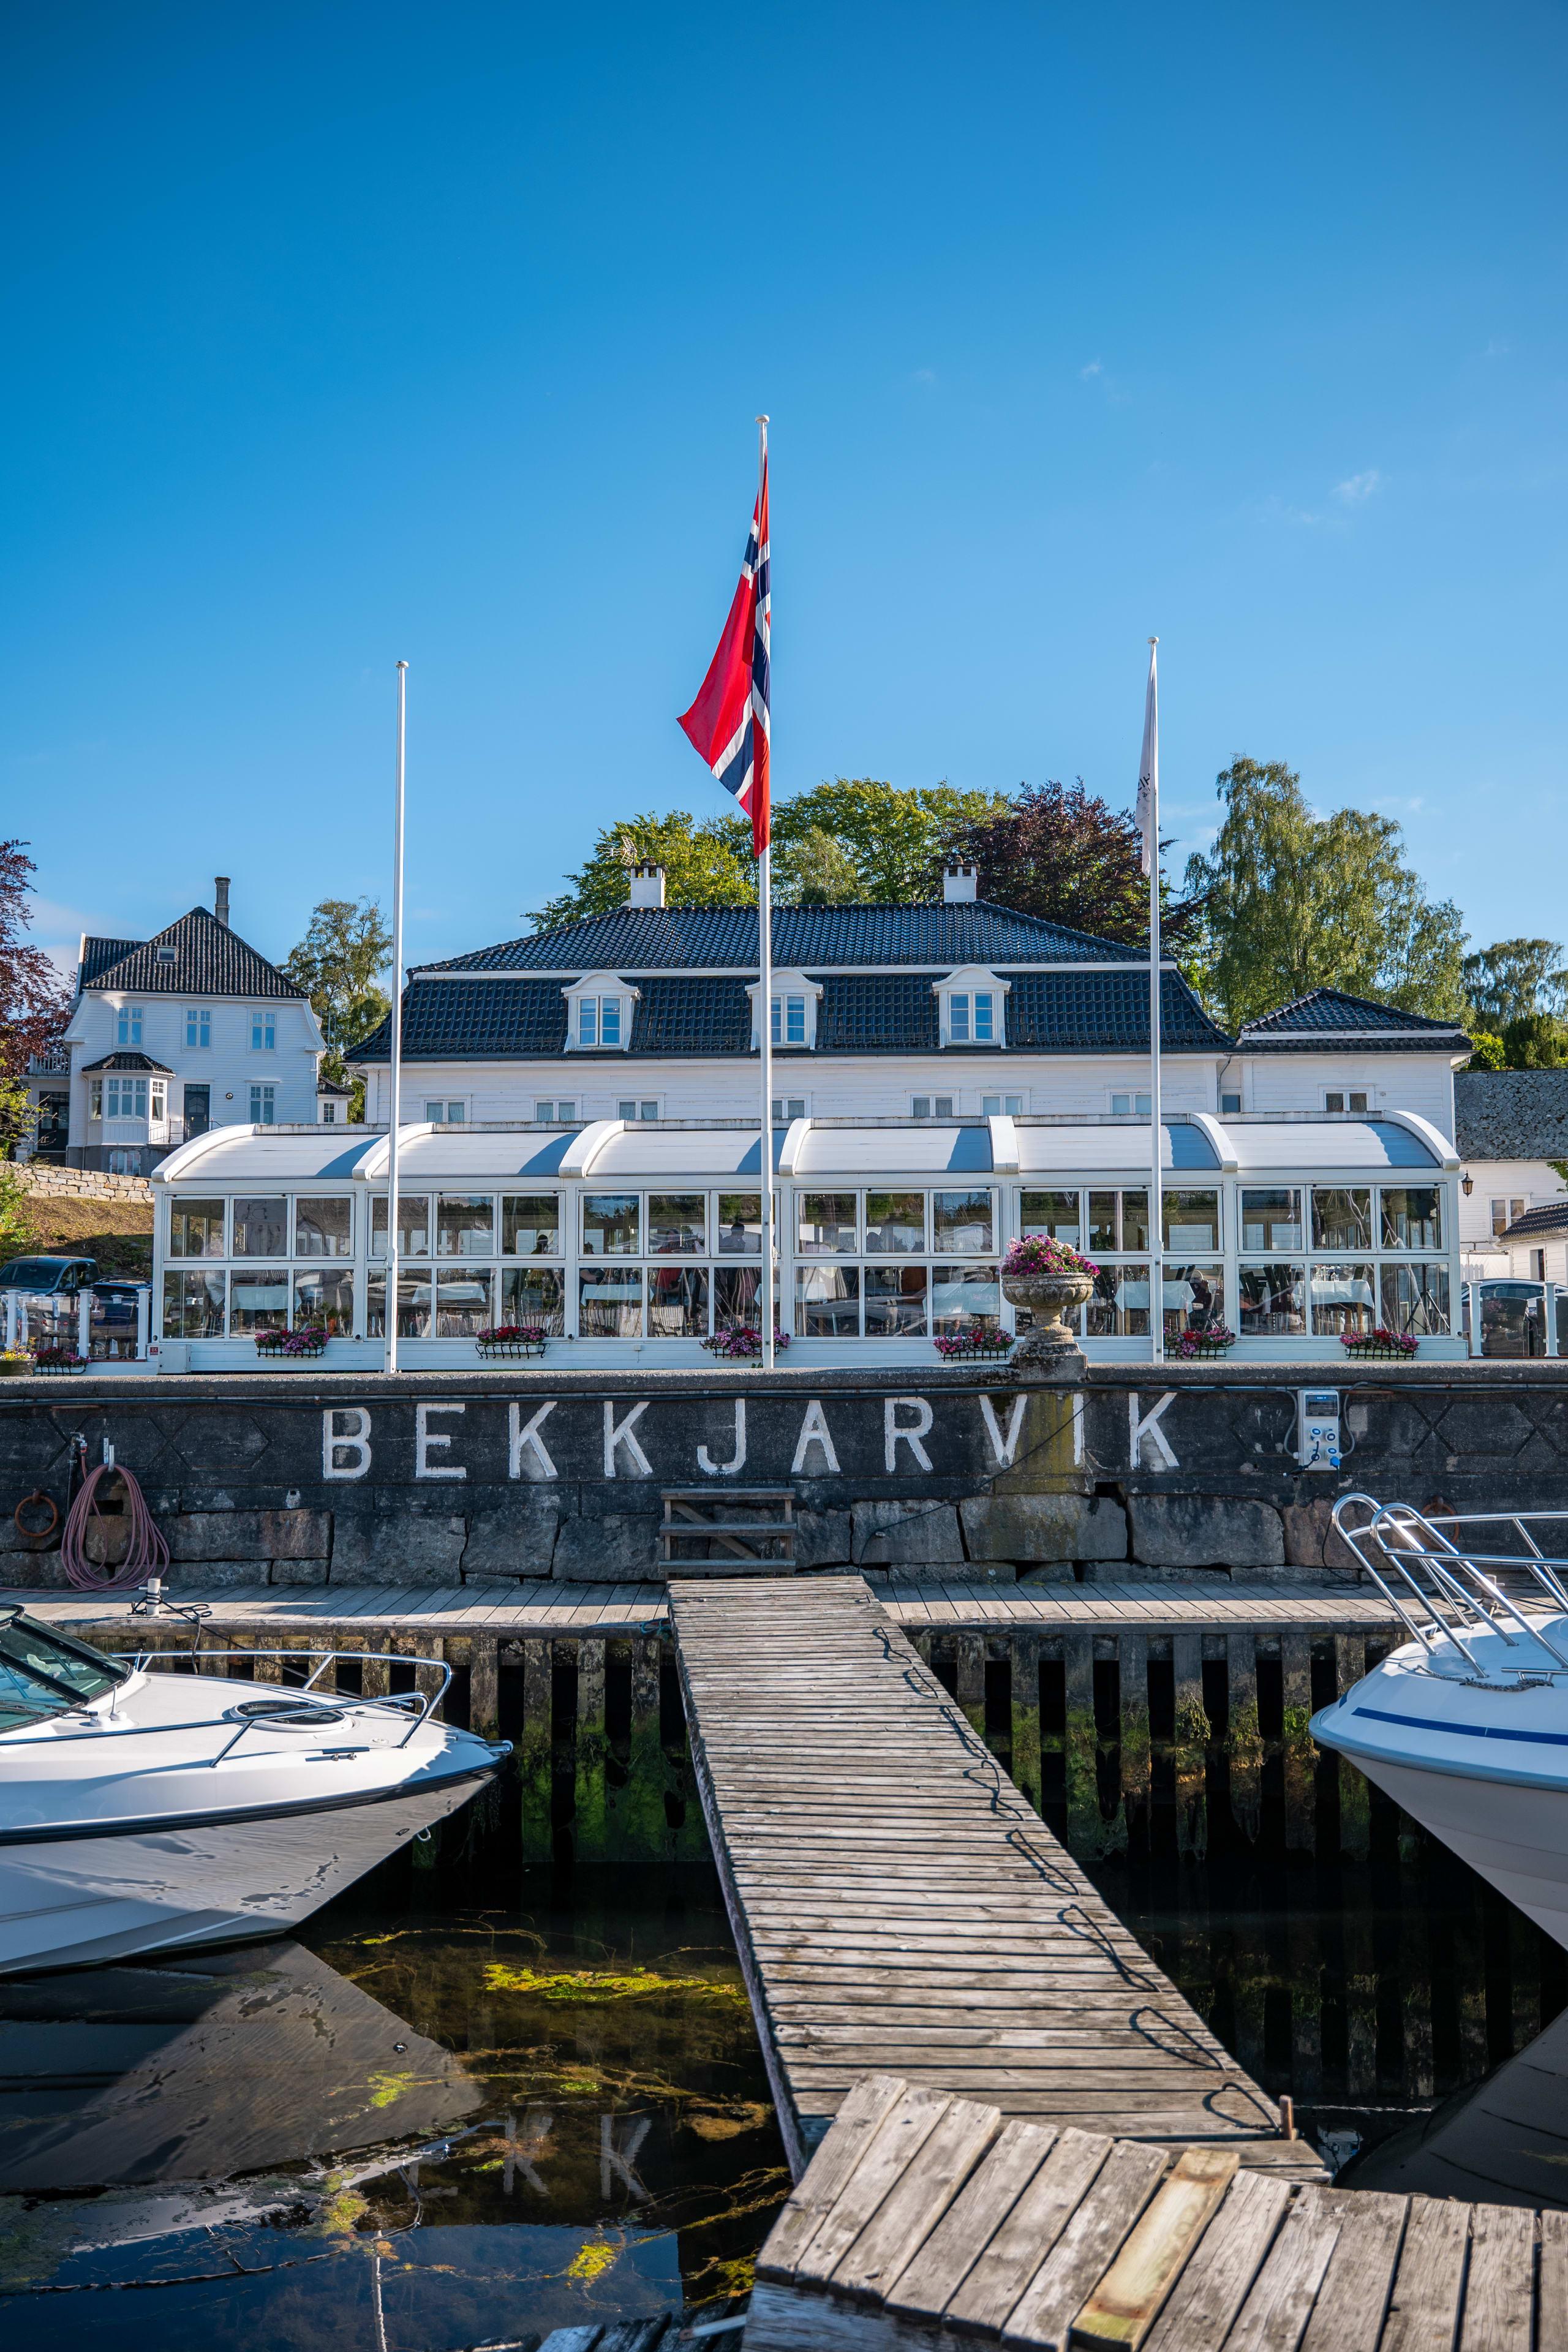 Bekkjarvik Gjestgiveri at Austevoll